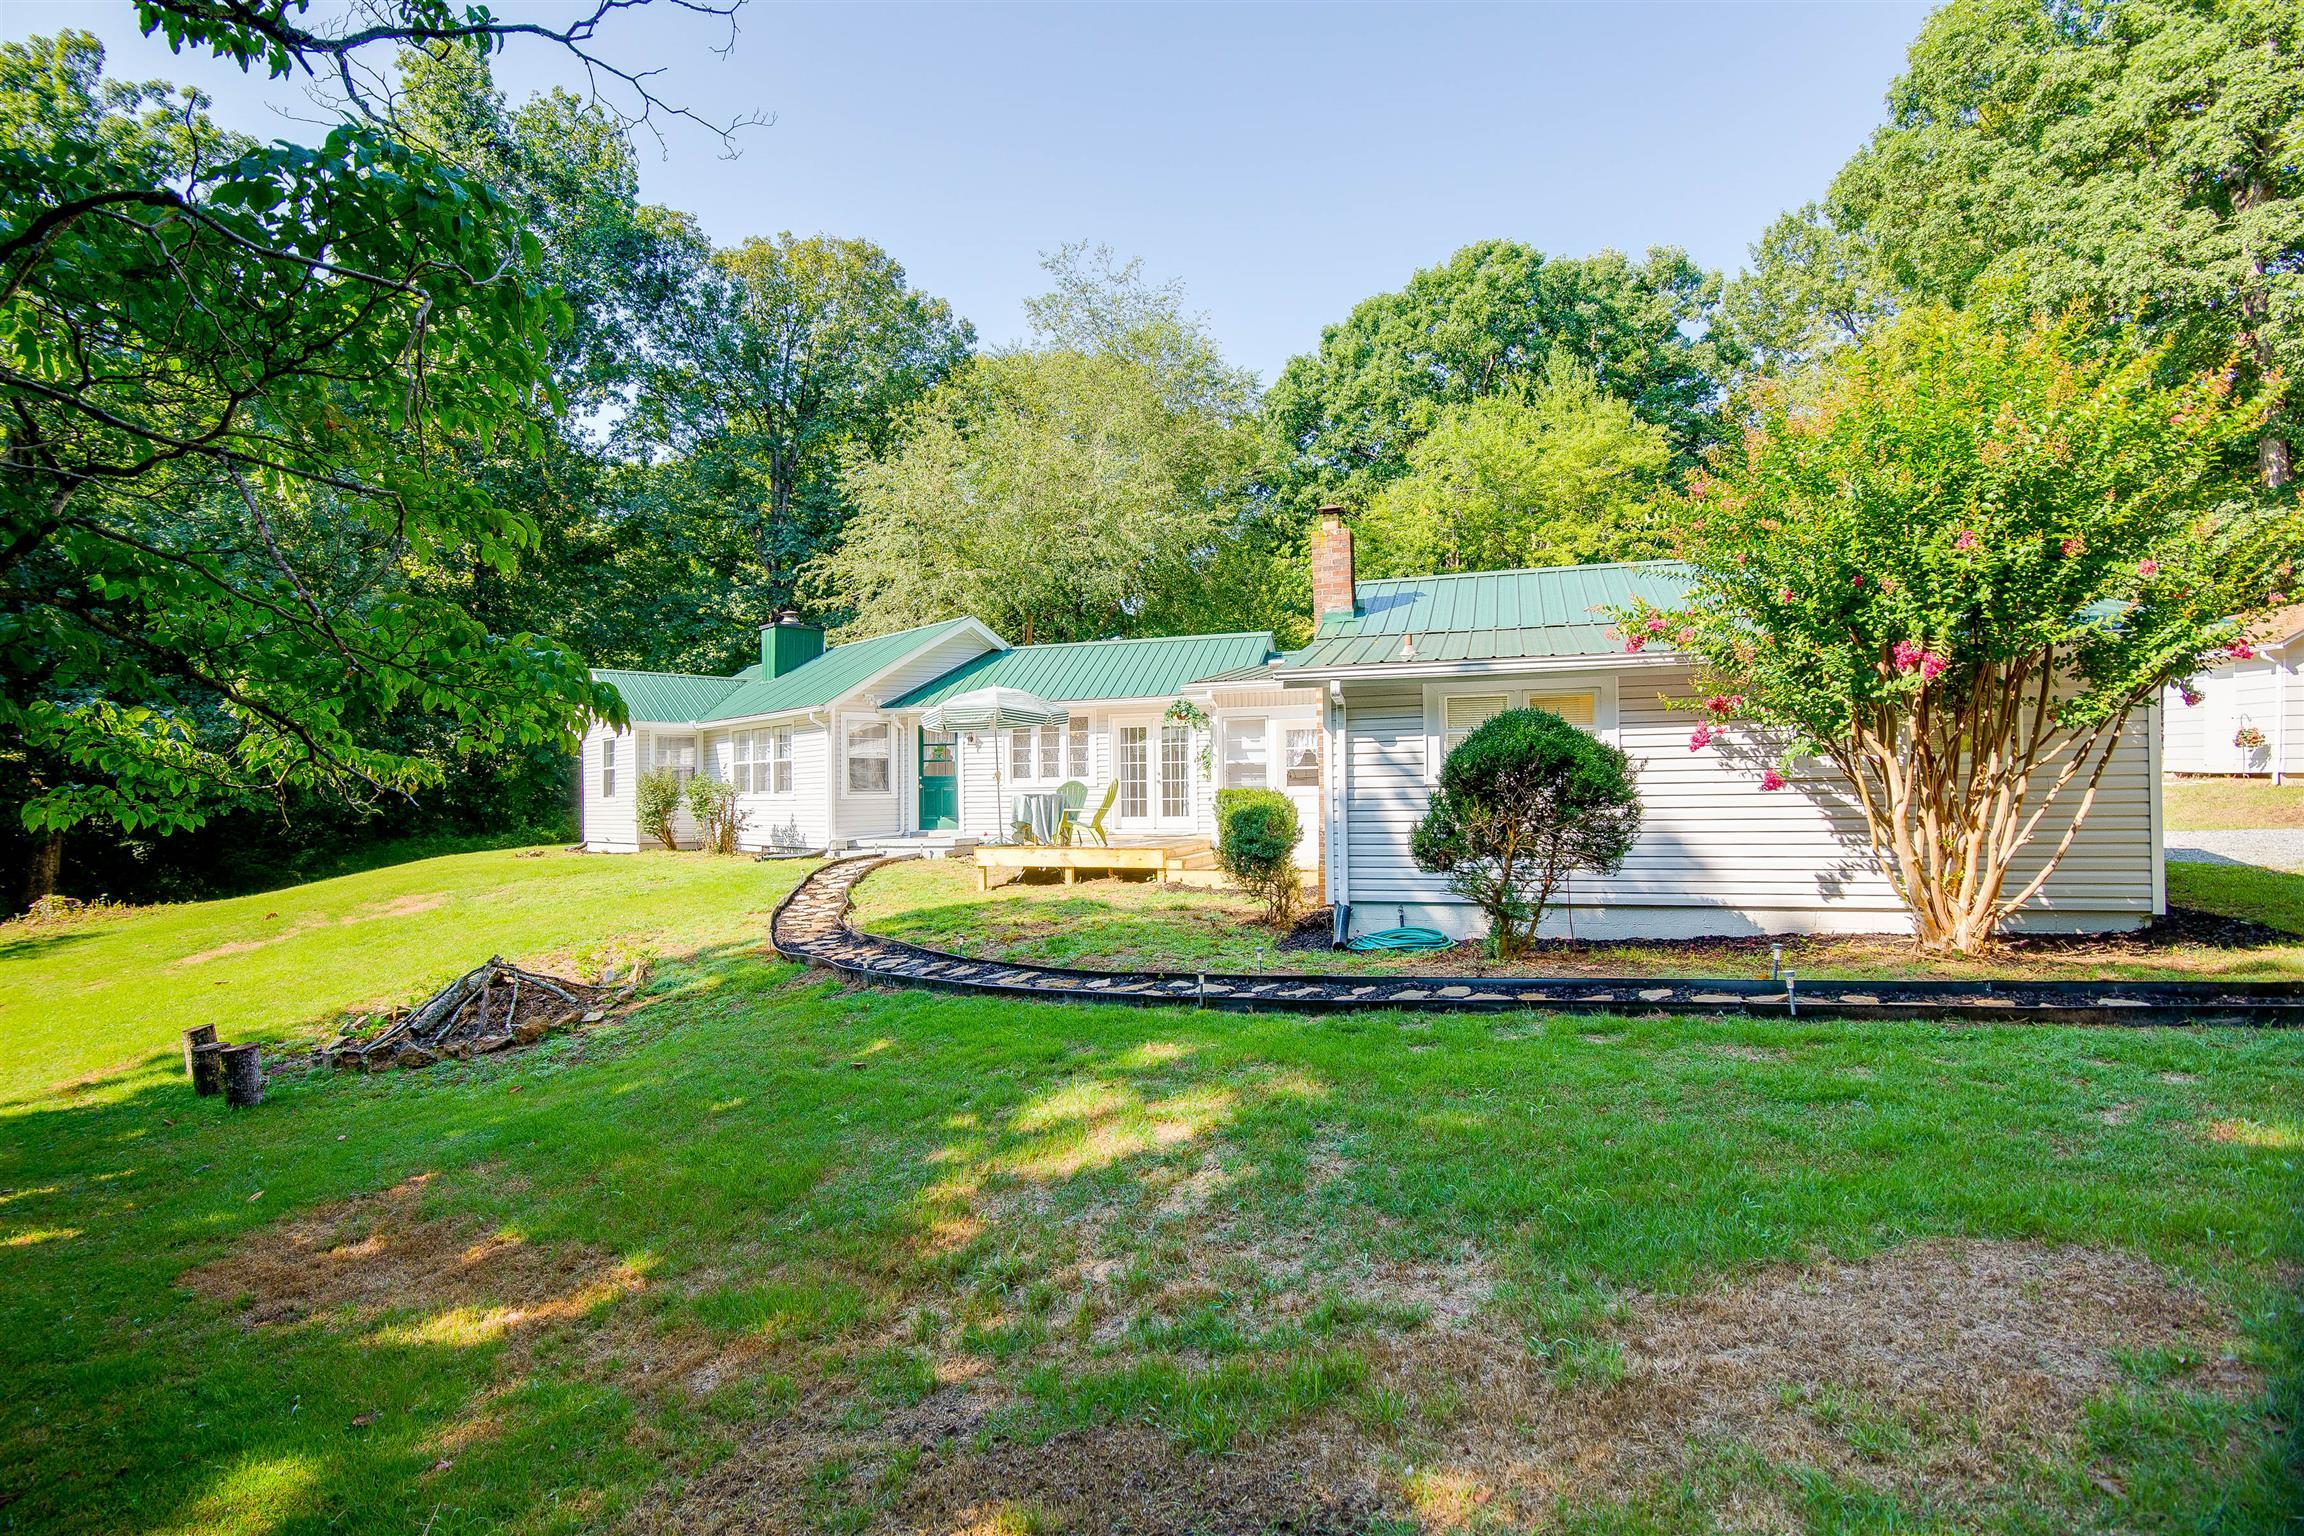 101 W Park Cir, Dickson, TN 37055 - Dickson, TN real estate listing